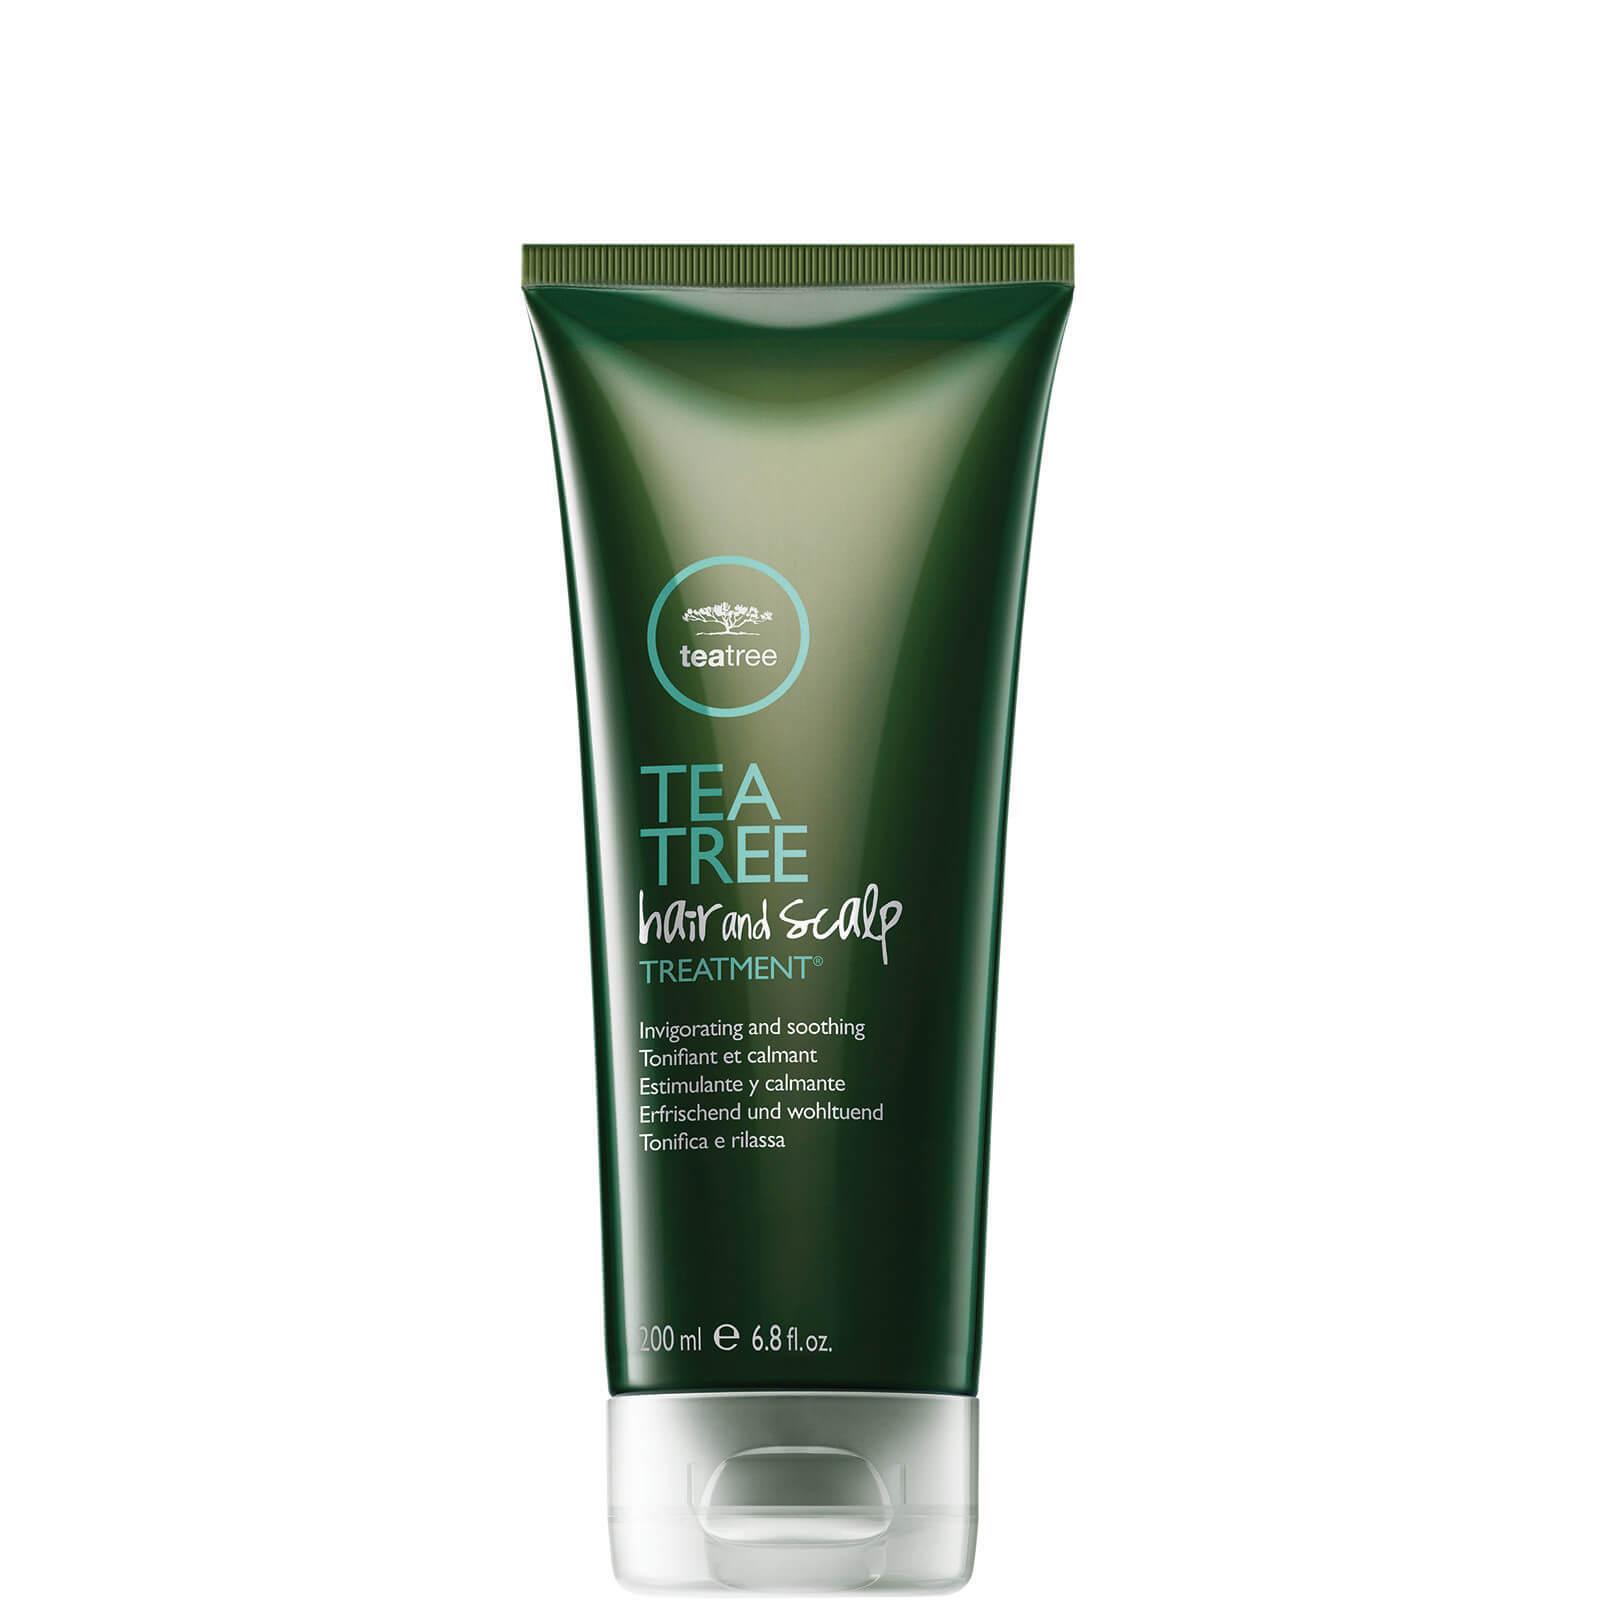 Купить Paul Mitchell Tea Tree Hair & Scalp Treatment - For Men (200ml)